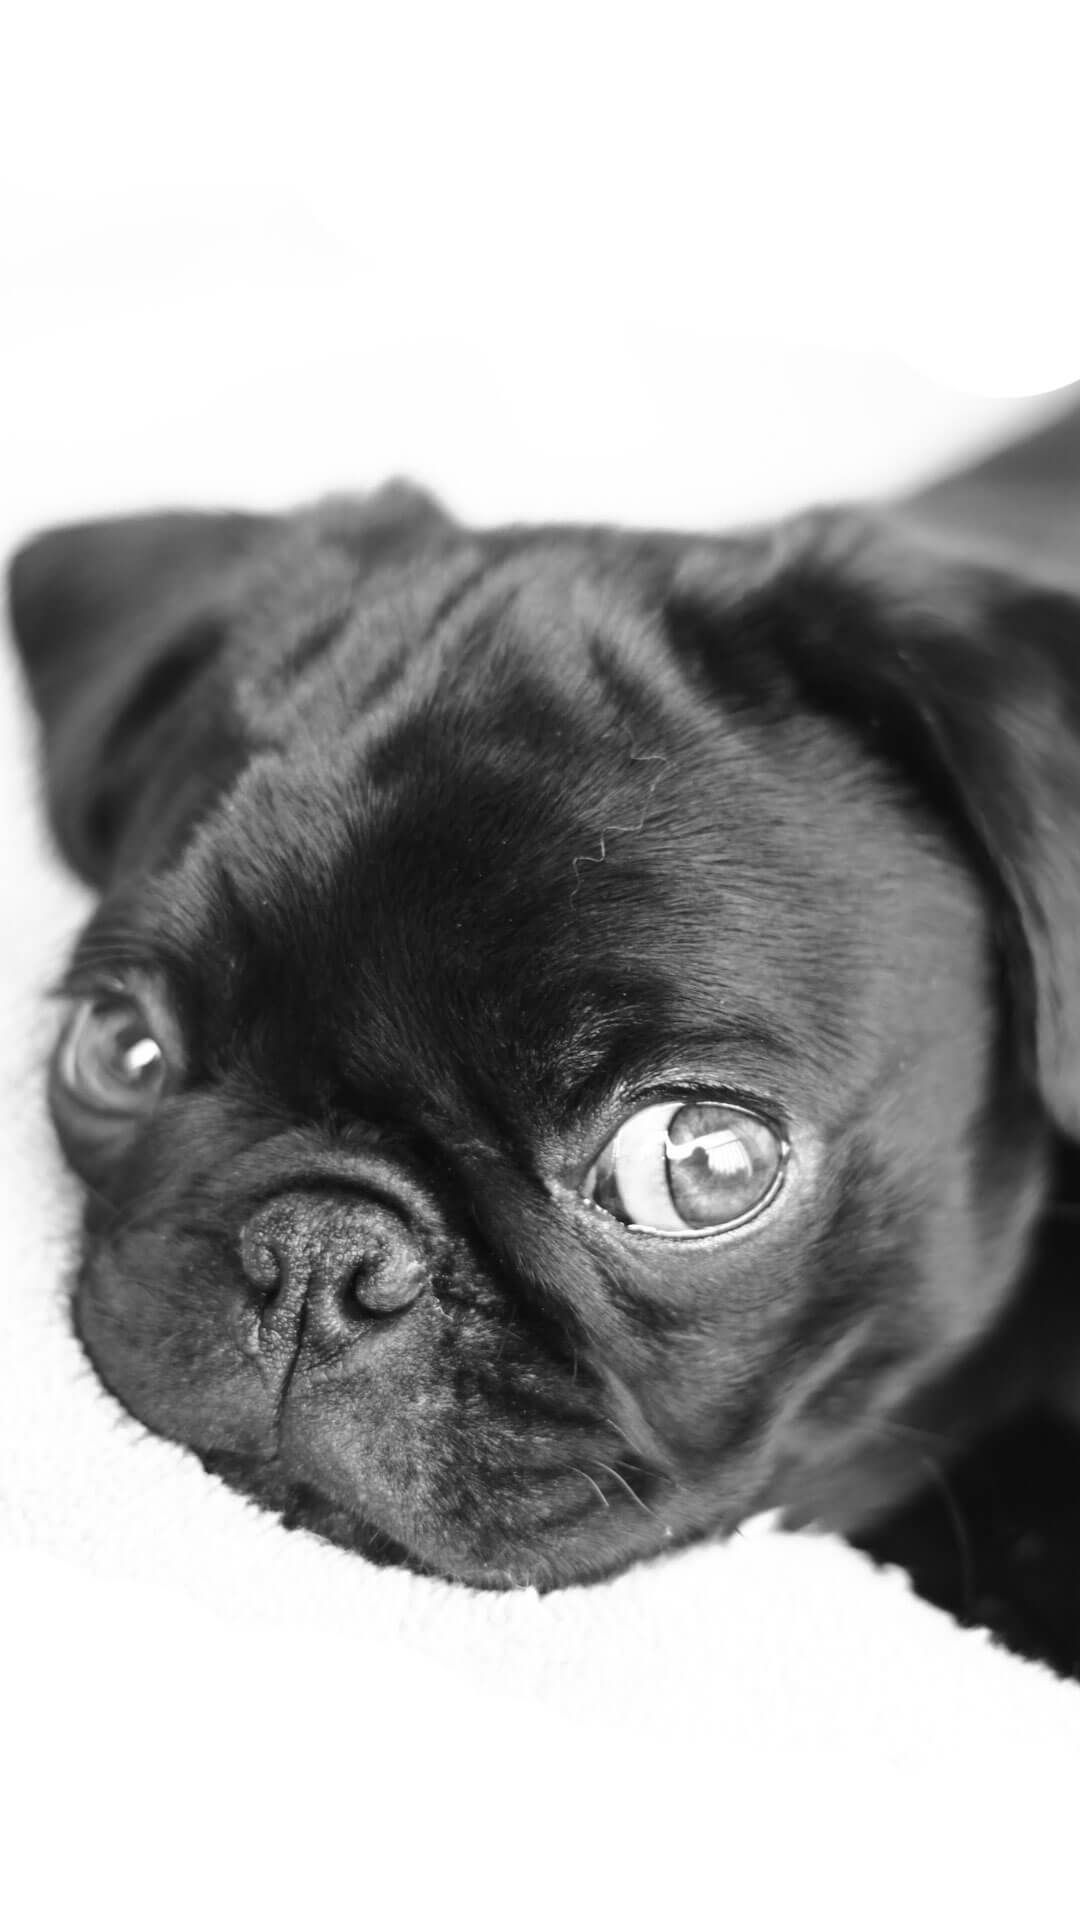 Cute Pug Puppies Wallpaper 8y7368y Fondos De Pantalla Para Ipad De Perritos Pug 1080x1920 Download Hd Wallpaper Wallpapertip